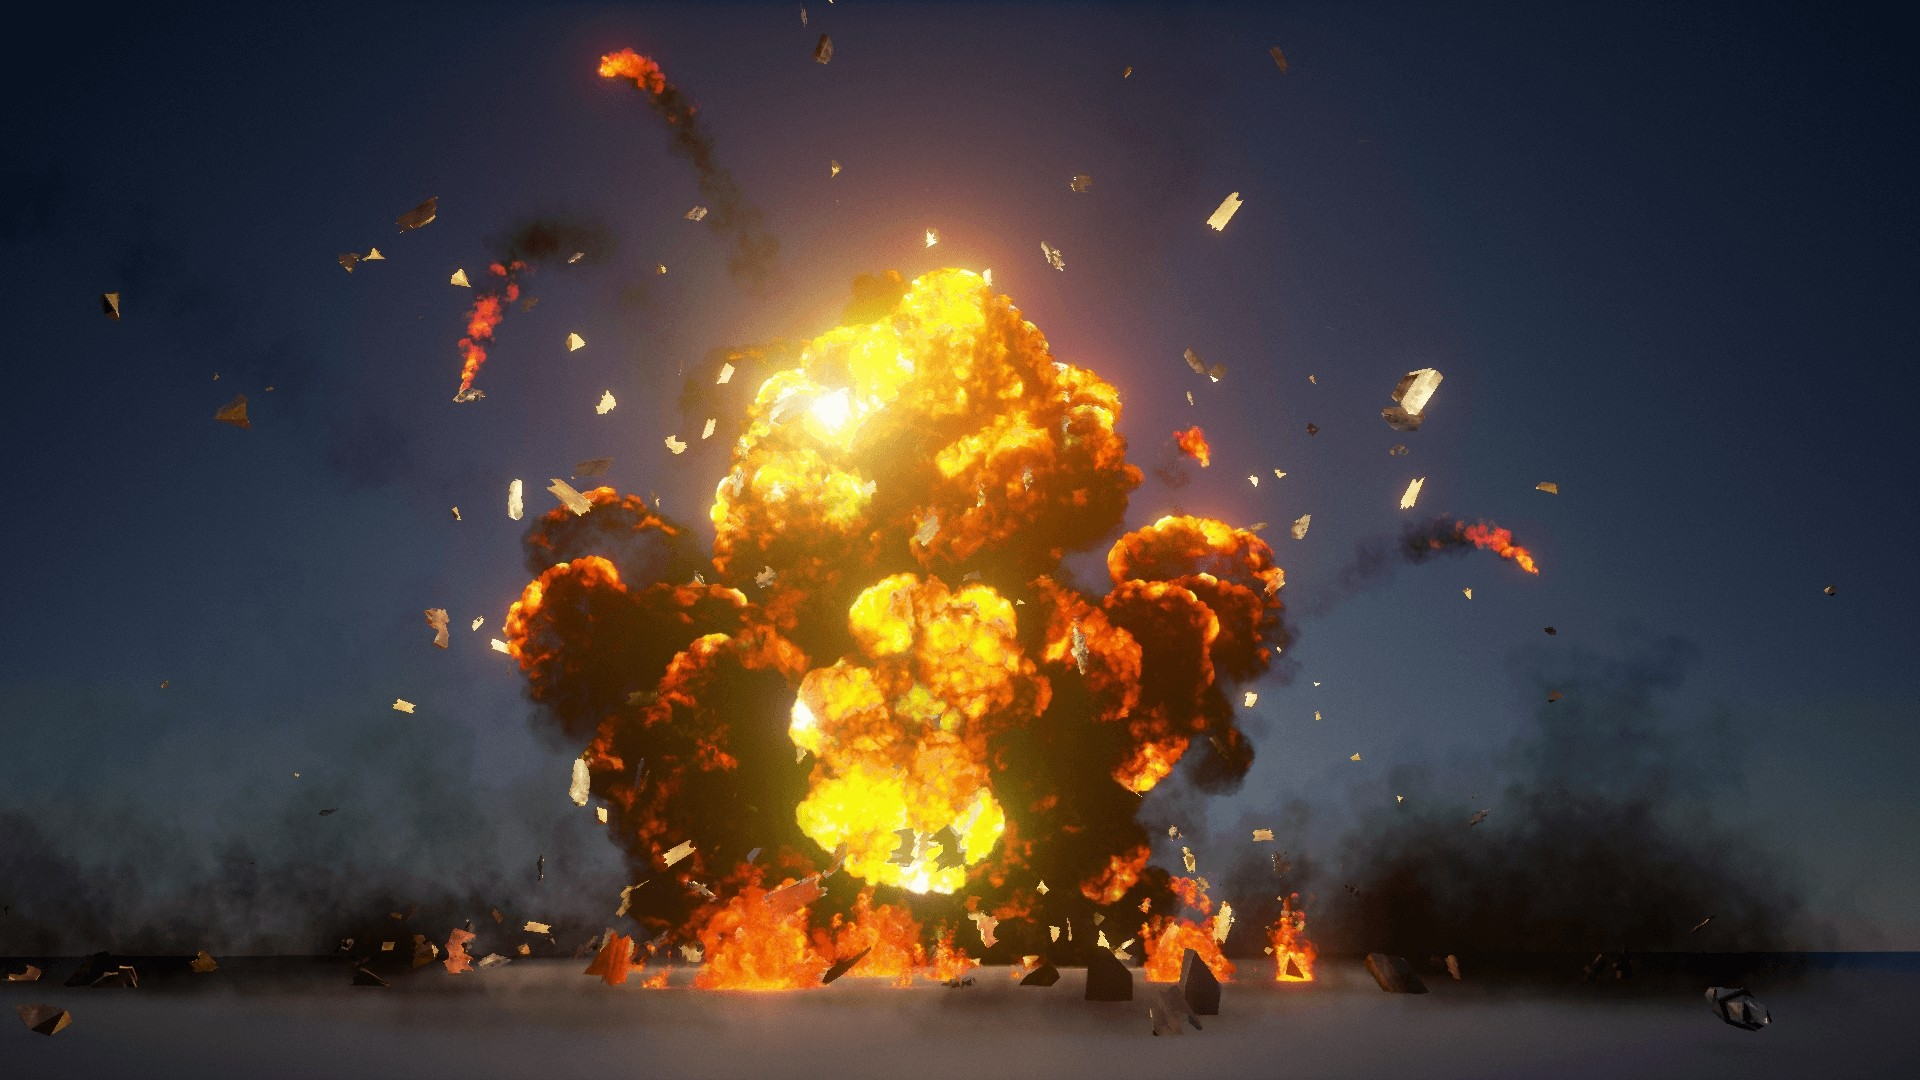 Explosion Desktop Wallpaper